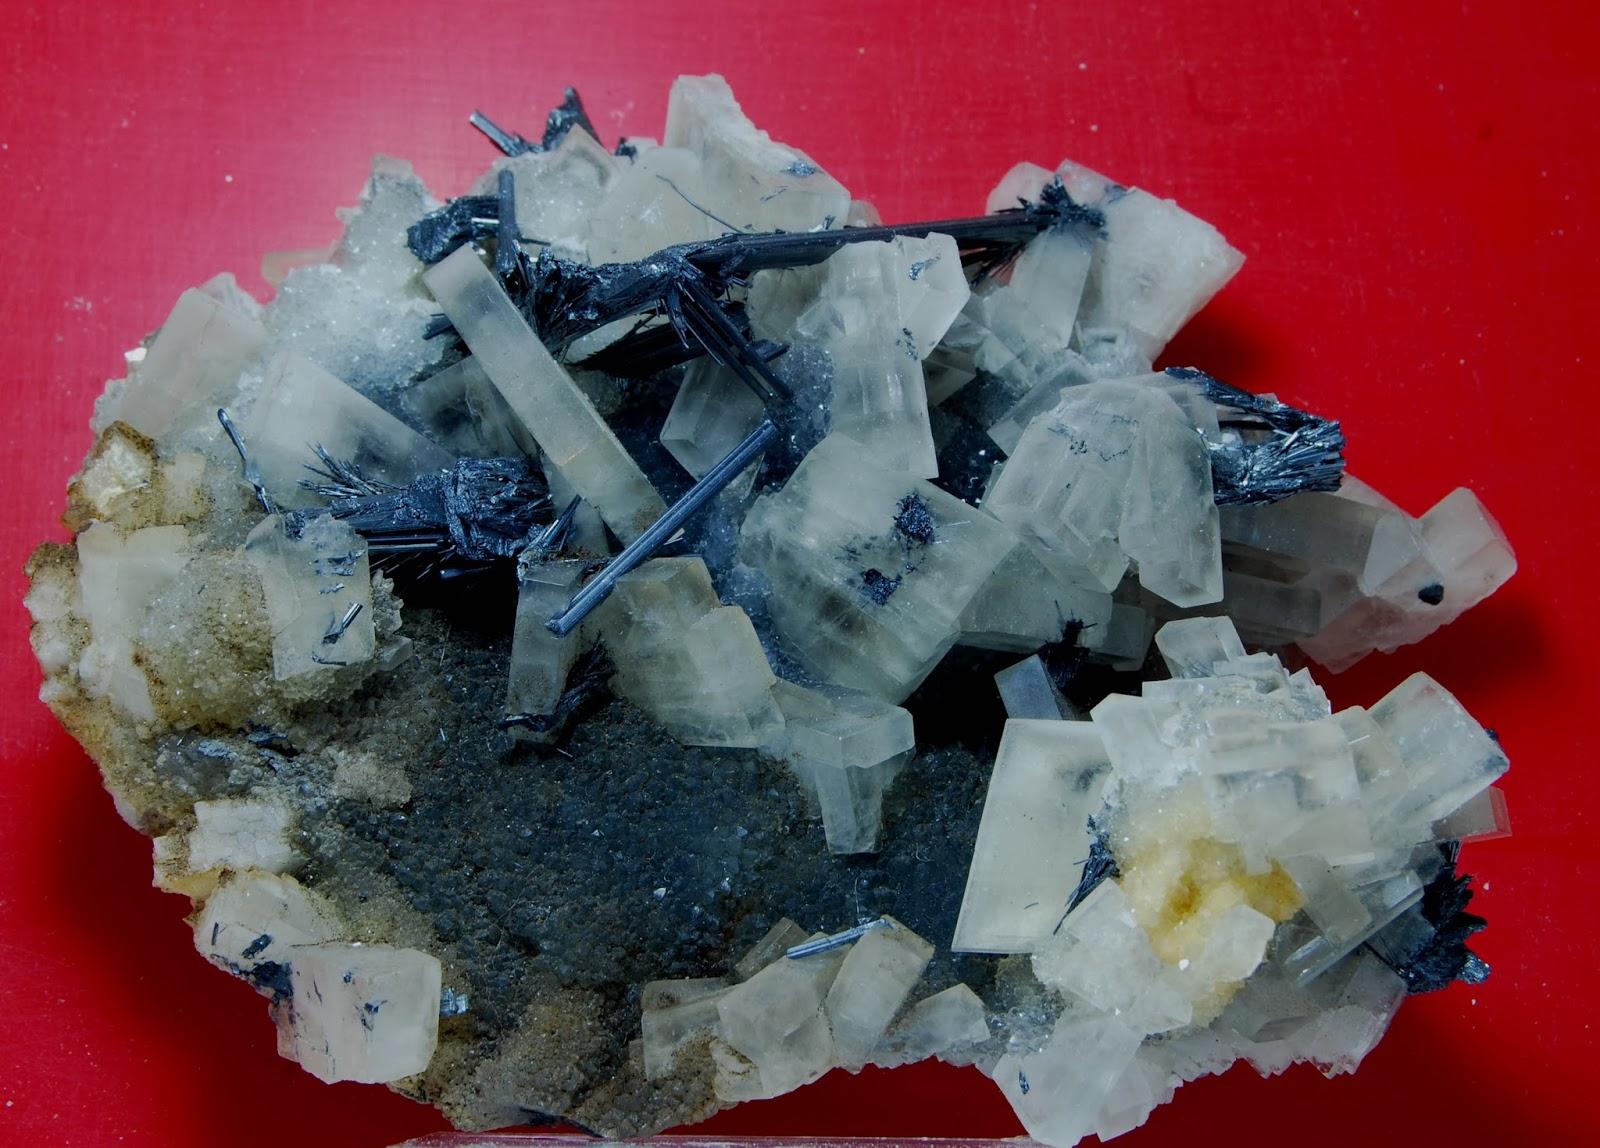 colección R. Fimia - Página 2 Antimonita+y+barita,+Xikuangshan,+Hunan,+China+